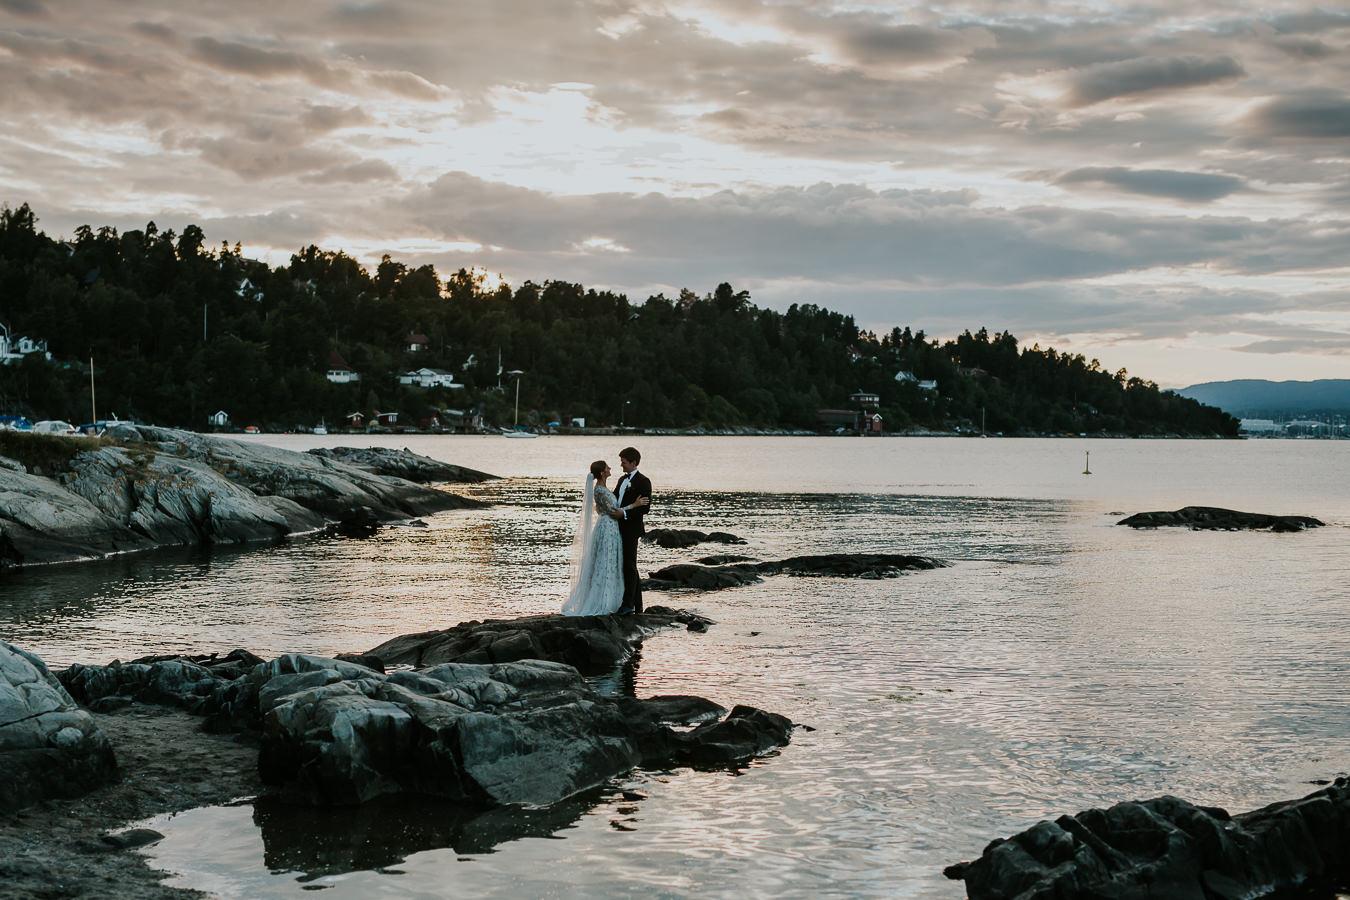 Bryllup-Hellviktangen-fotograf-tvedt-167.jpg